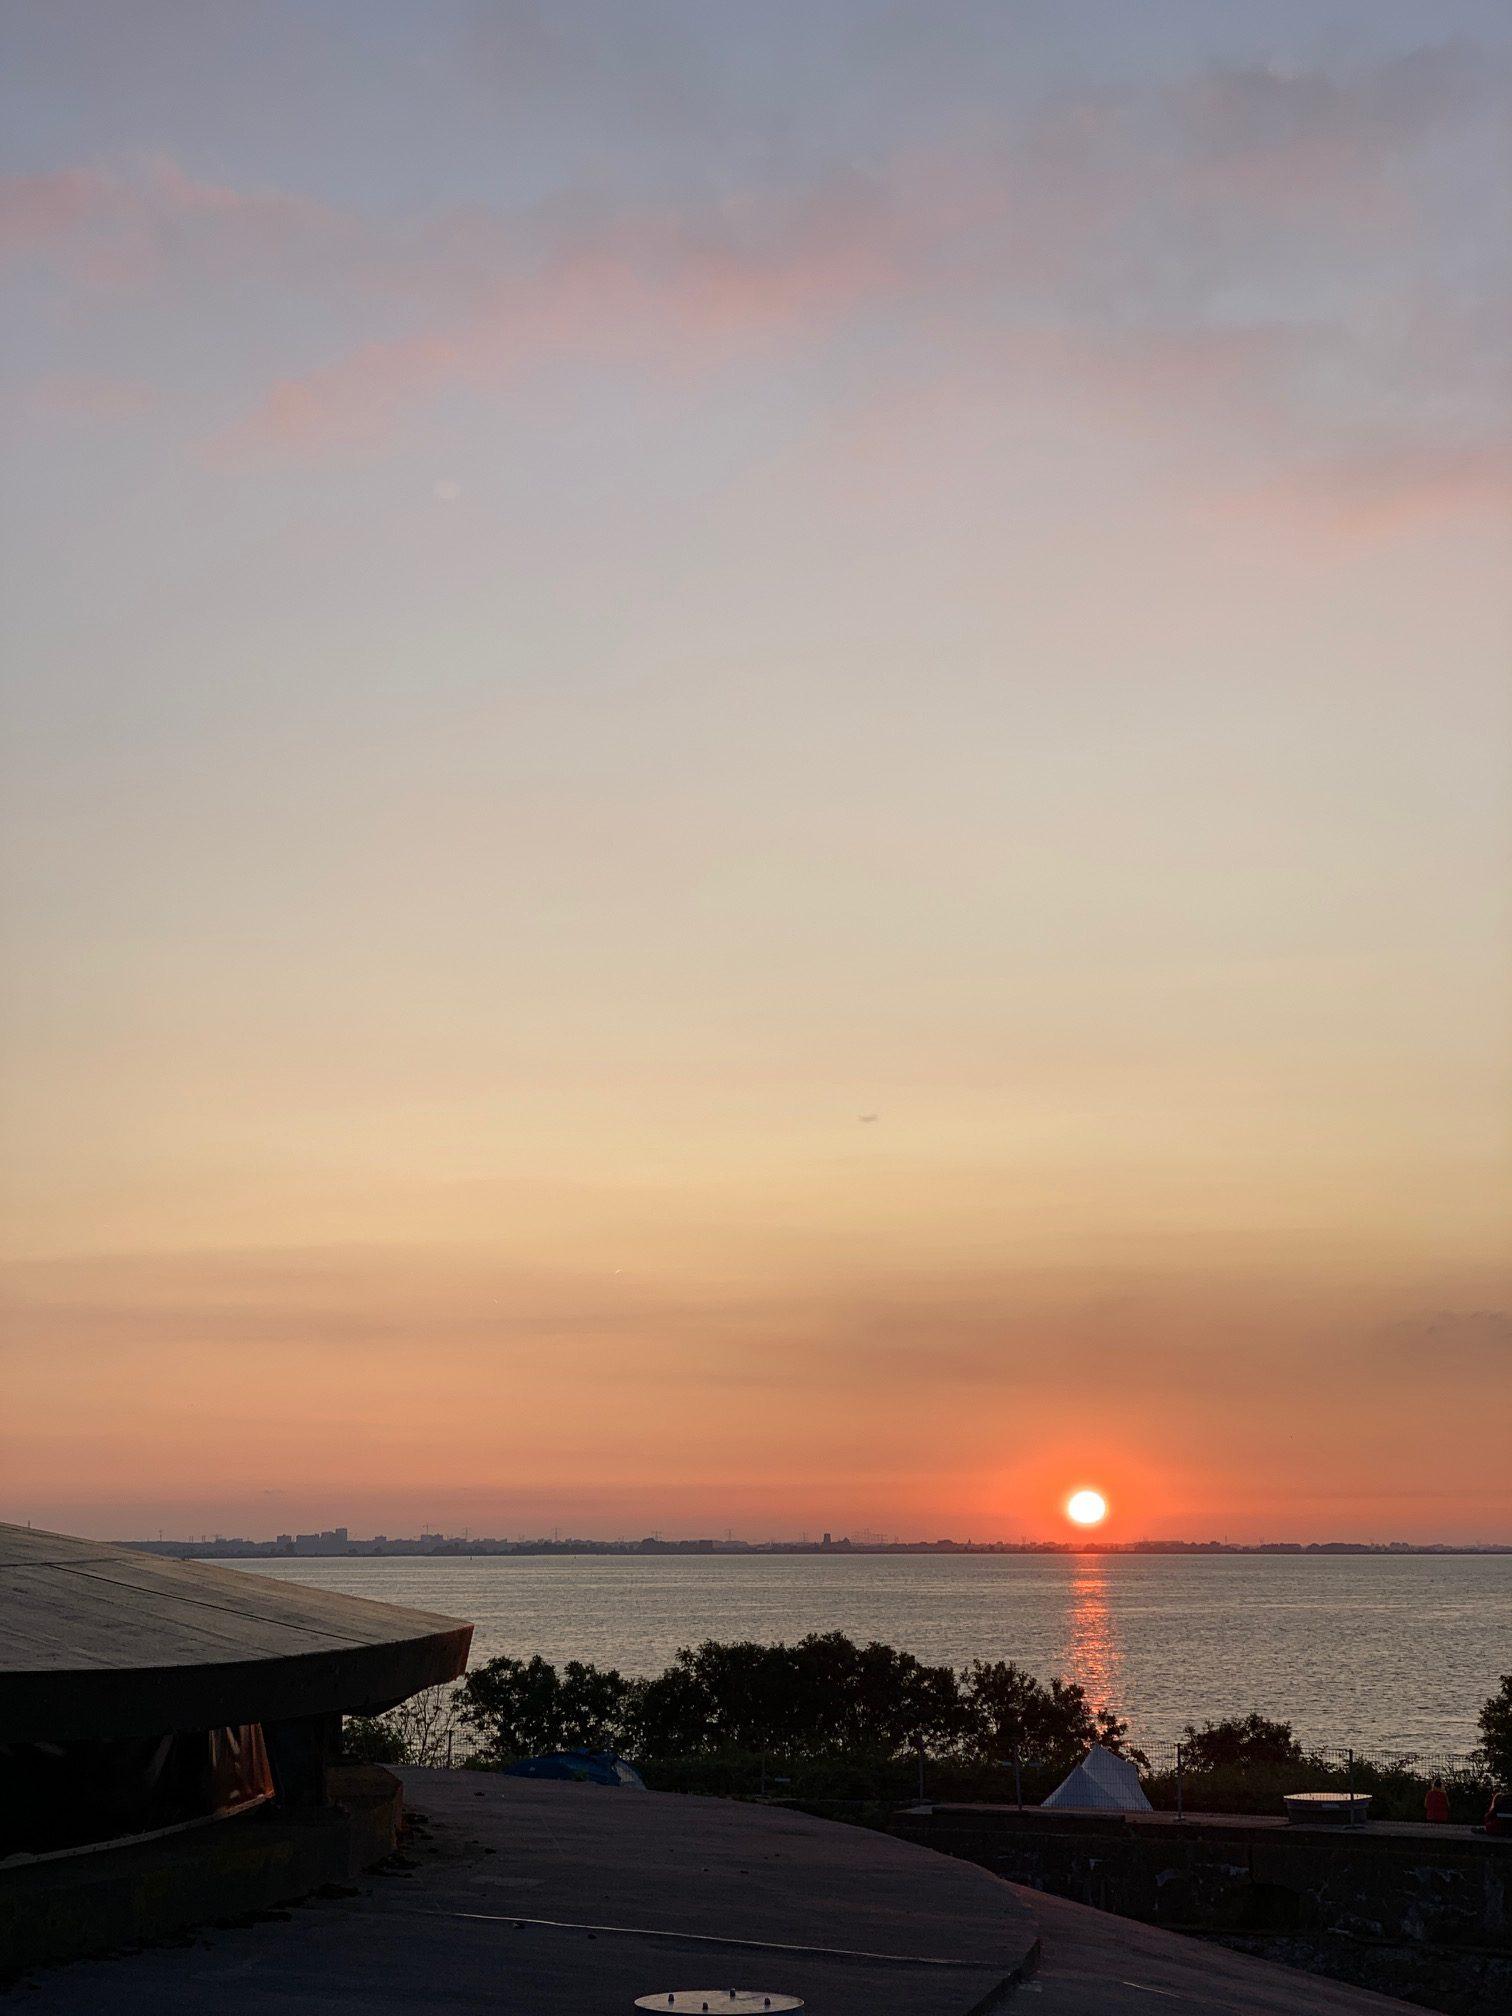 Pampusnachten ondergaande zon op Pampus